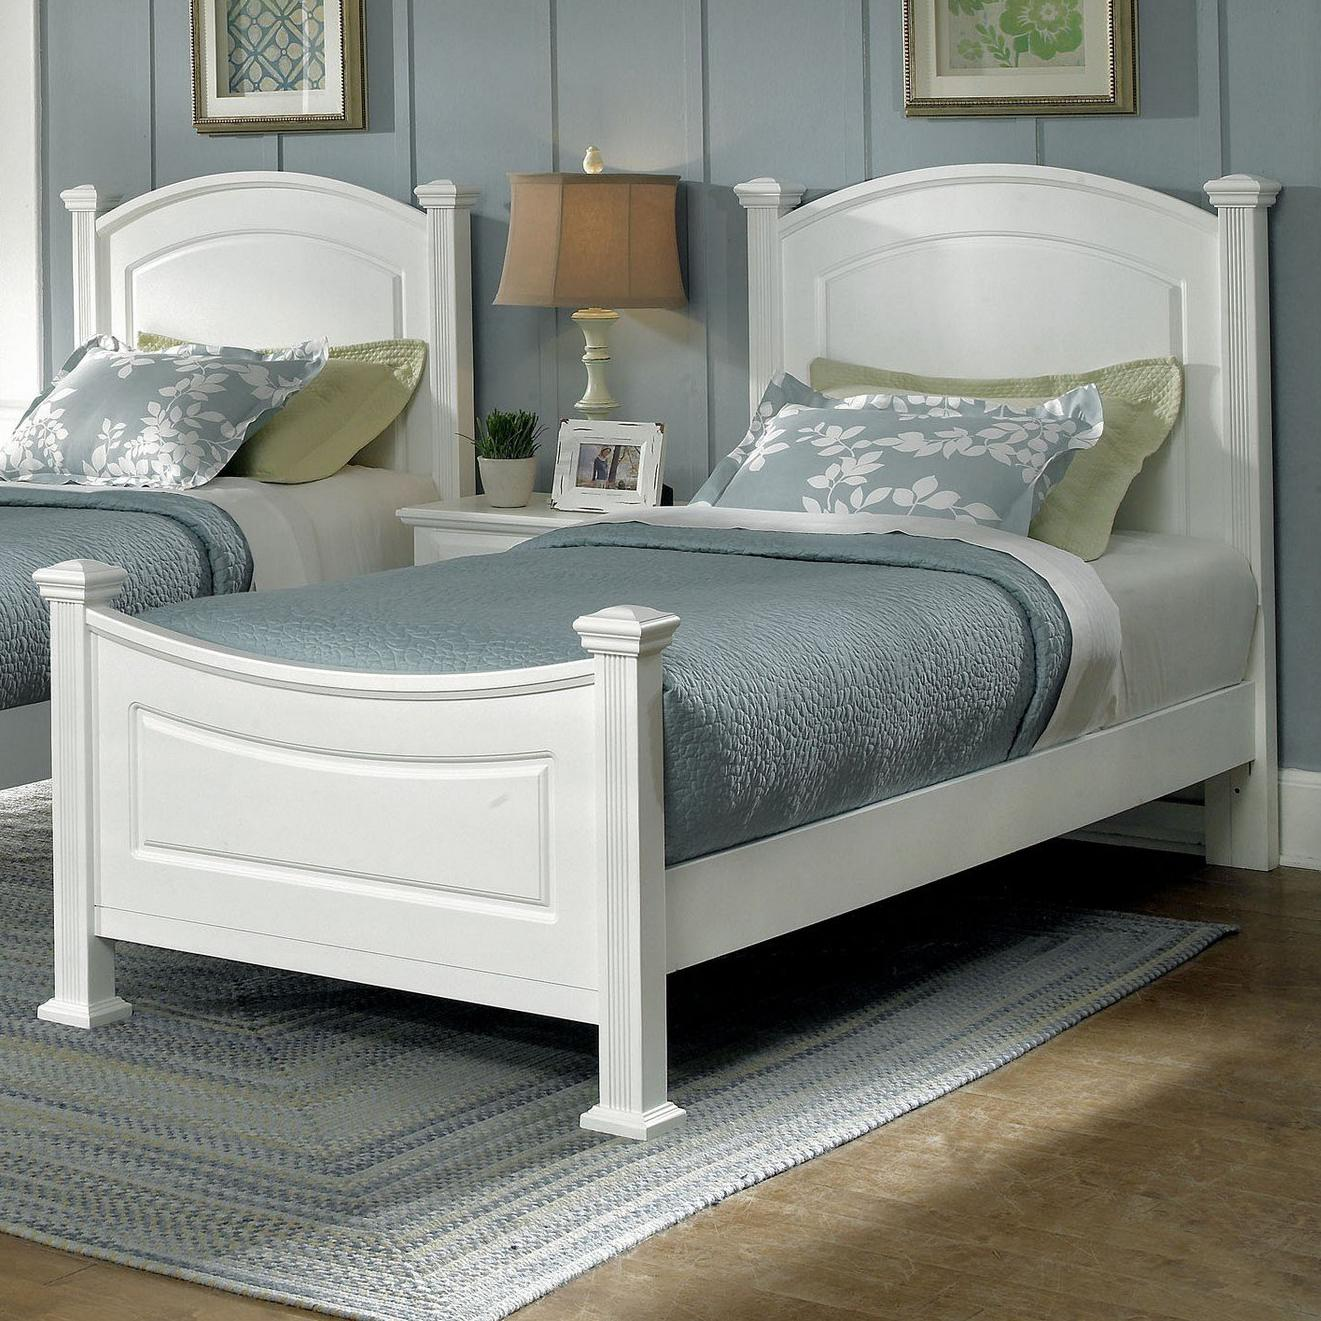 Vaughan Bassett Hamilton Franklin Twin Panel Bed Dunk Bright Furniture Panel Beds